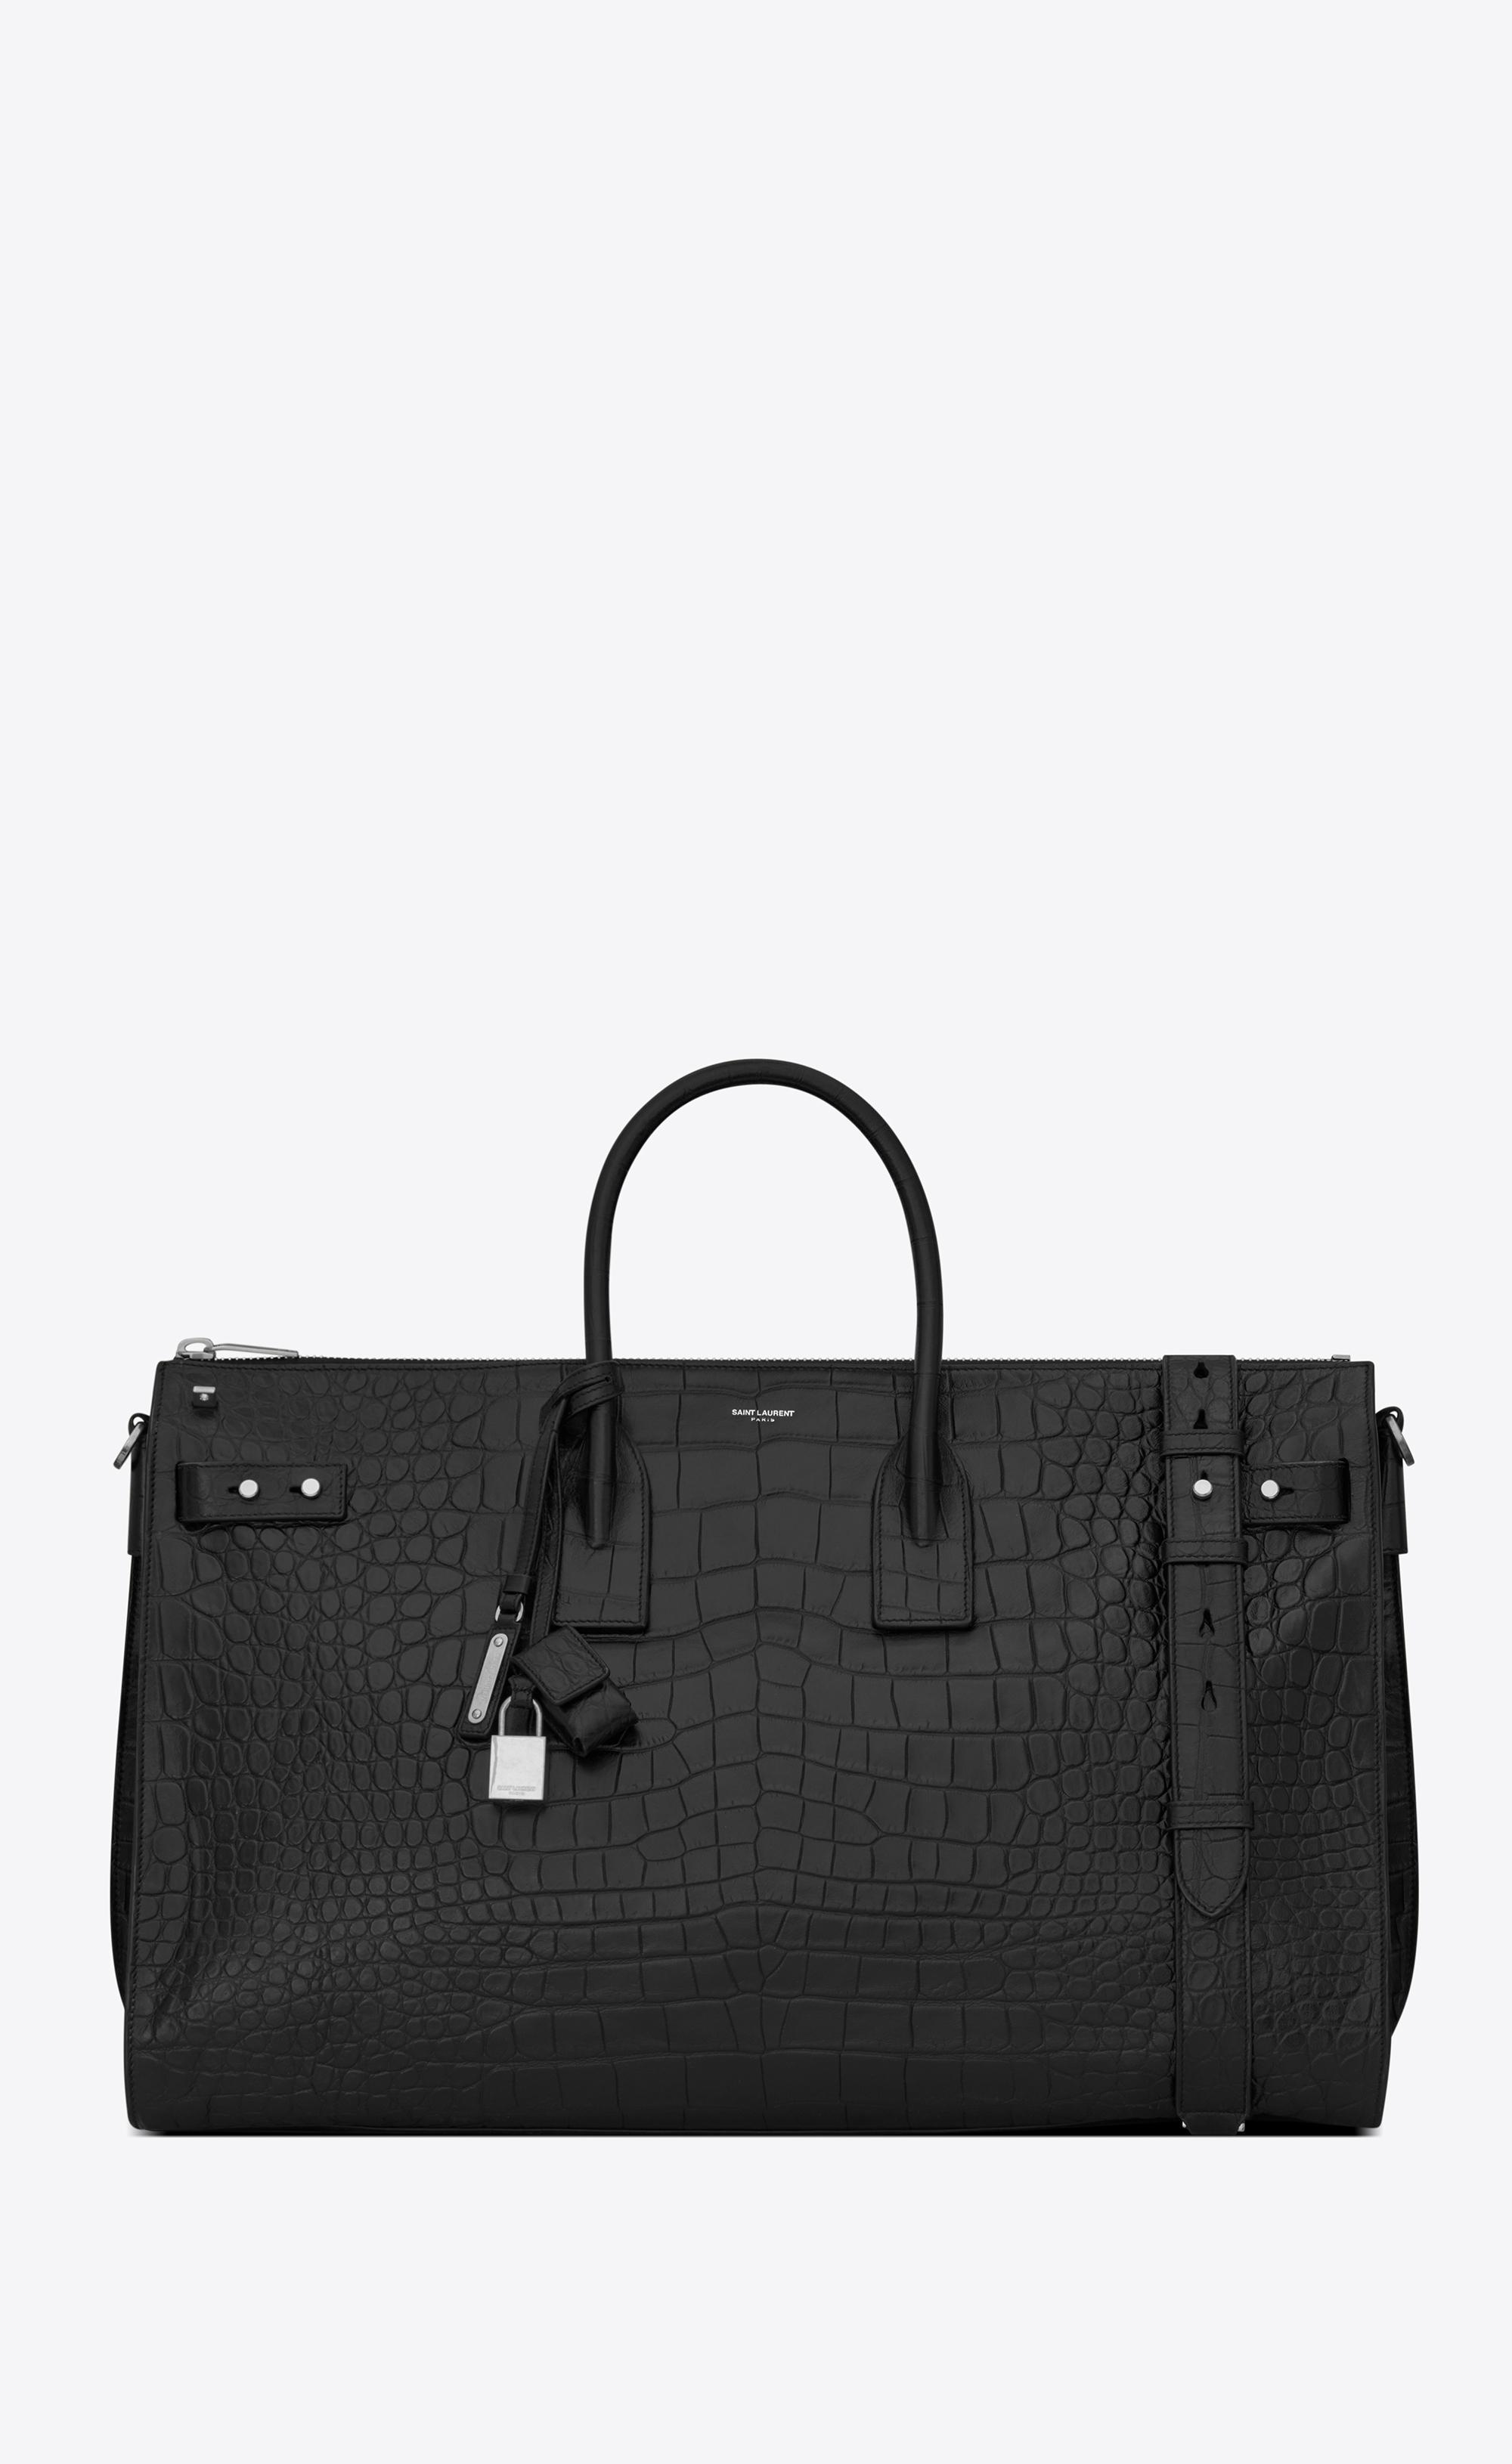 1c1e49e5b4b2 Saint Laurent - Black Sac De Jour 48-hour Duffle Bag In Embossed Crocodile  for